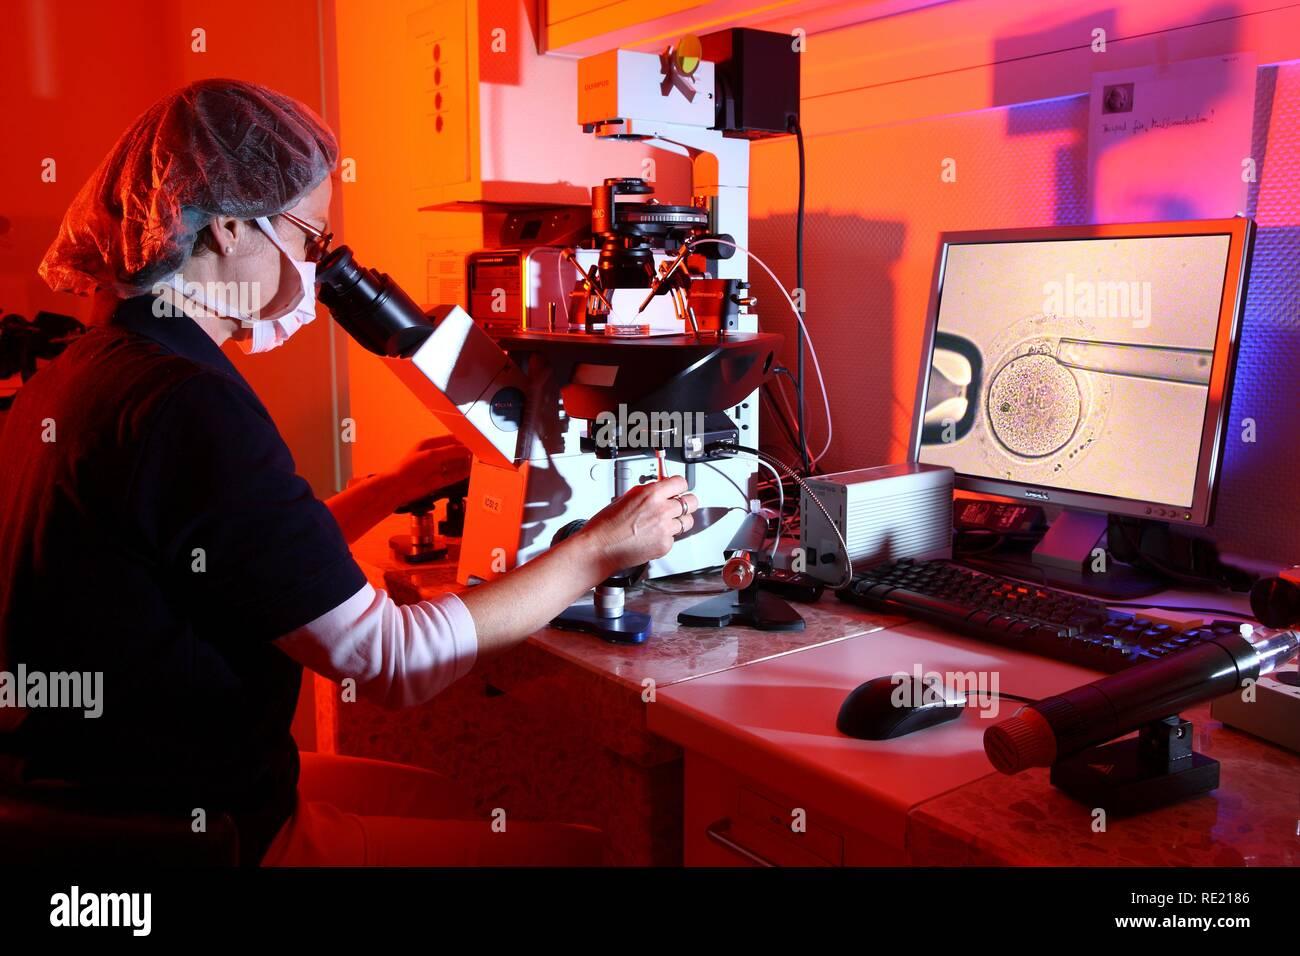 Polar body diagnosis, PBD, chromosomal genetic study of the fertilized ovum, Centre for Reproductive Medicine - Stock Image